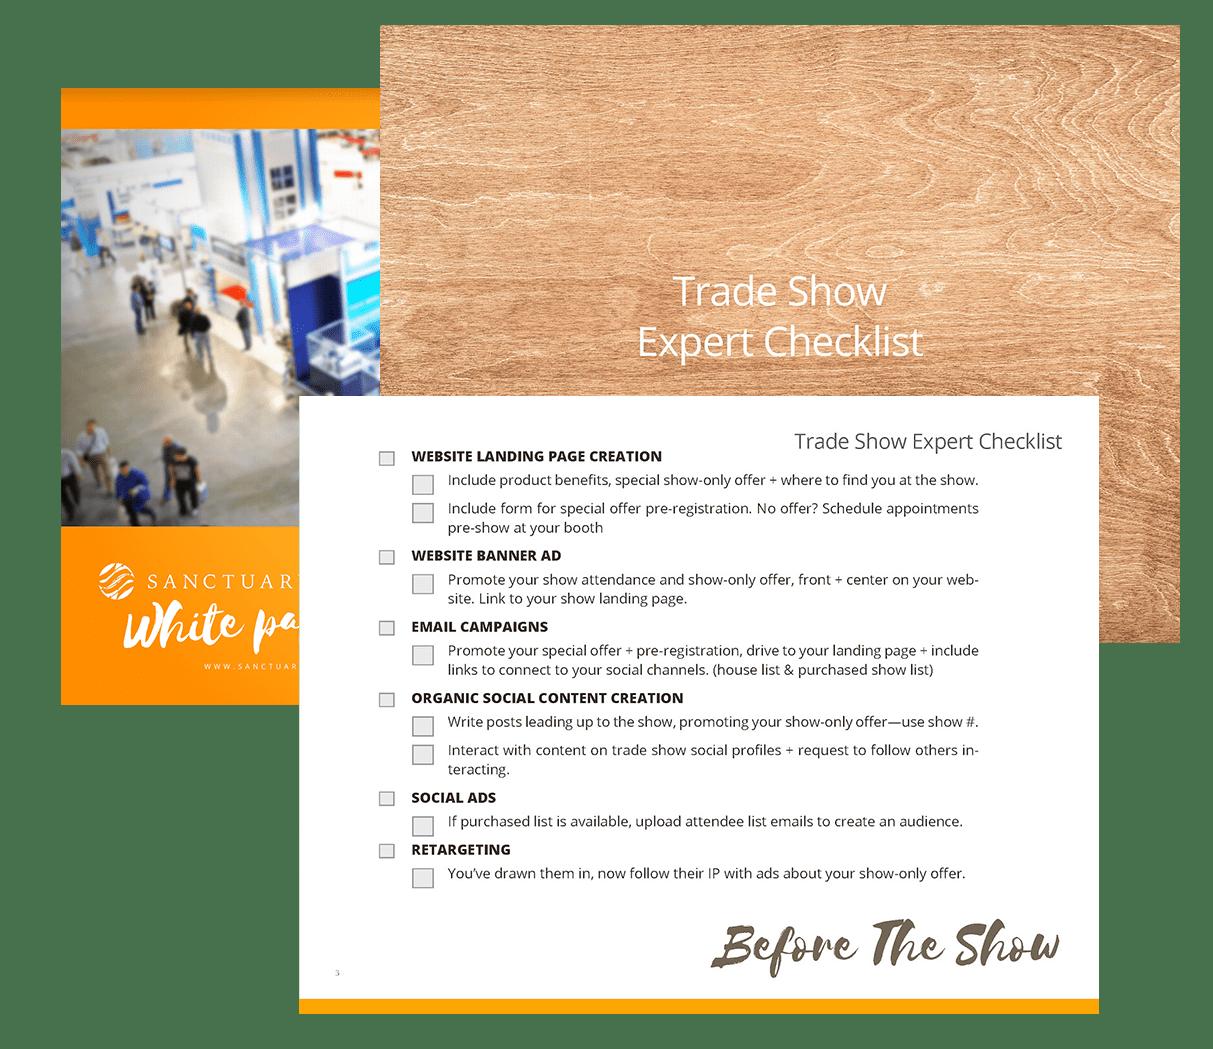 Checklist and Whitepaper - Tradeshow